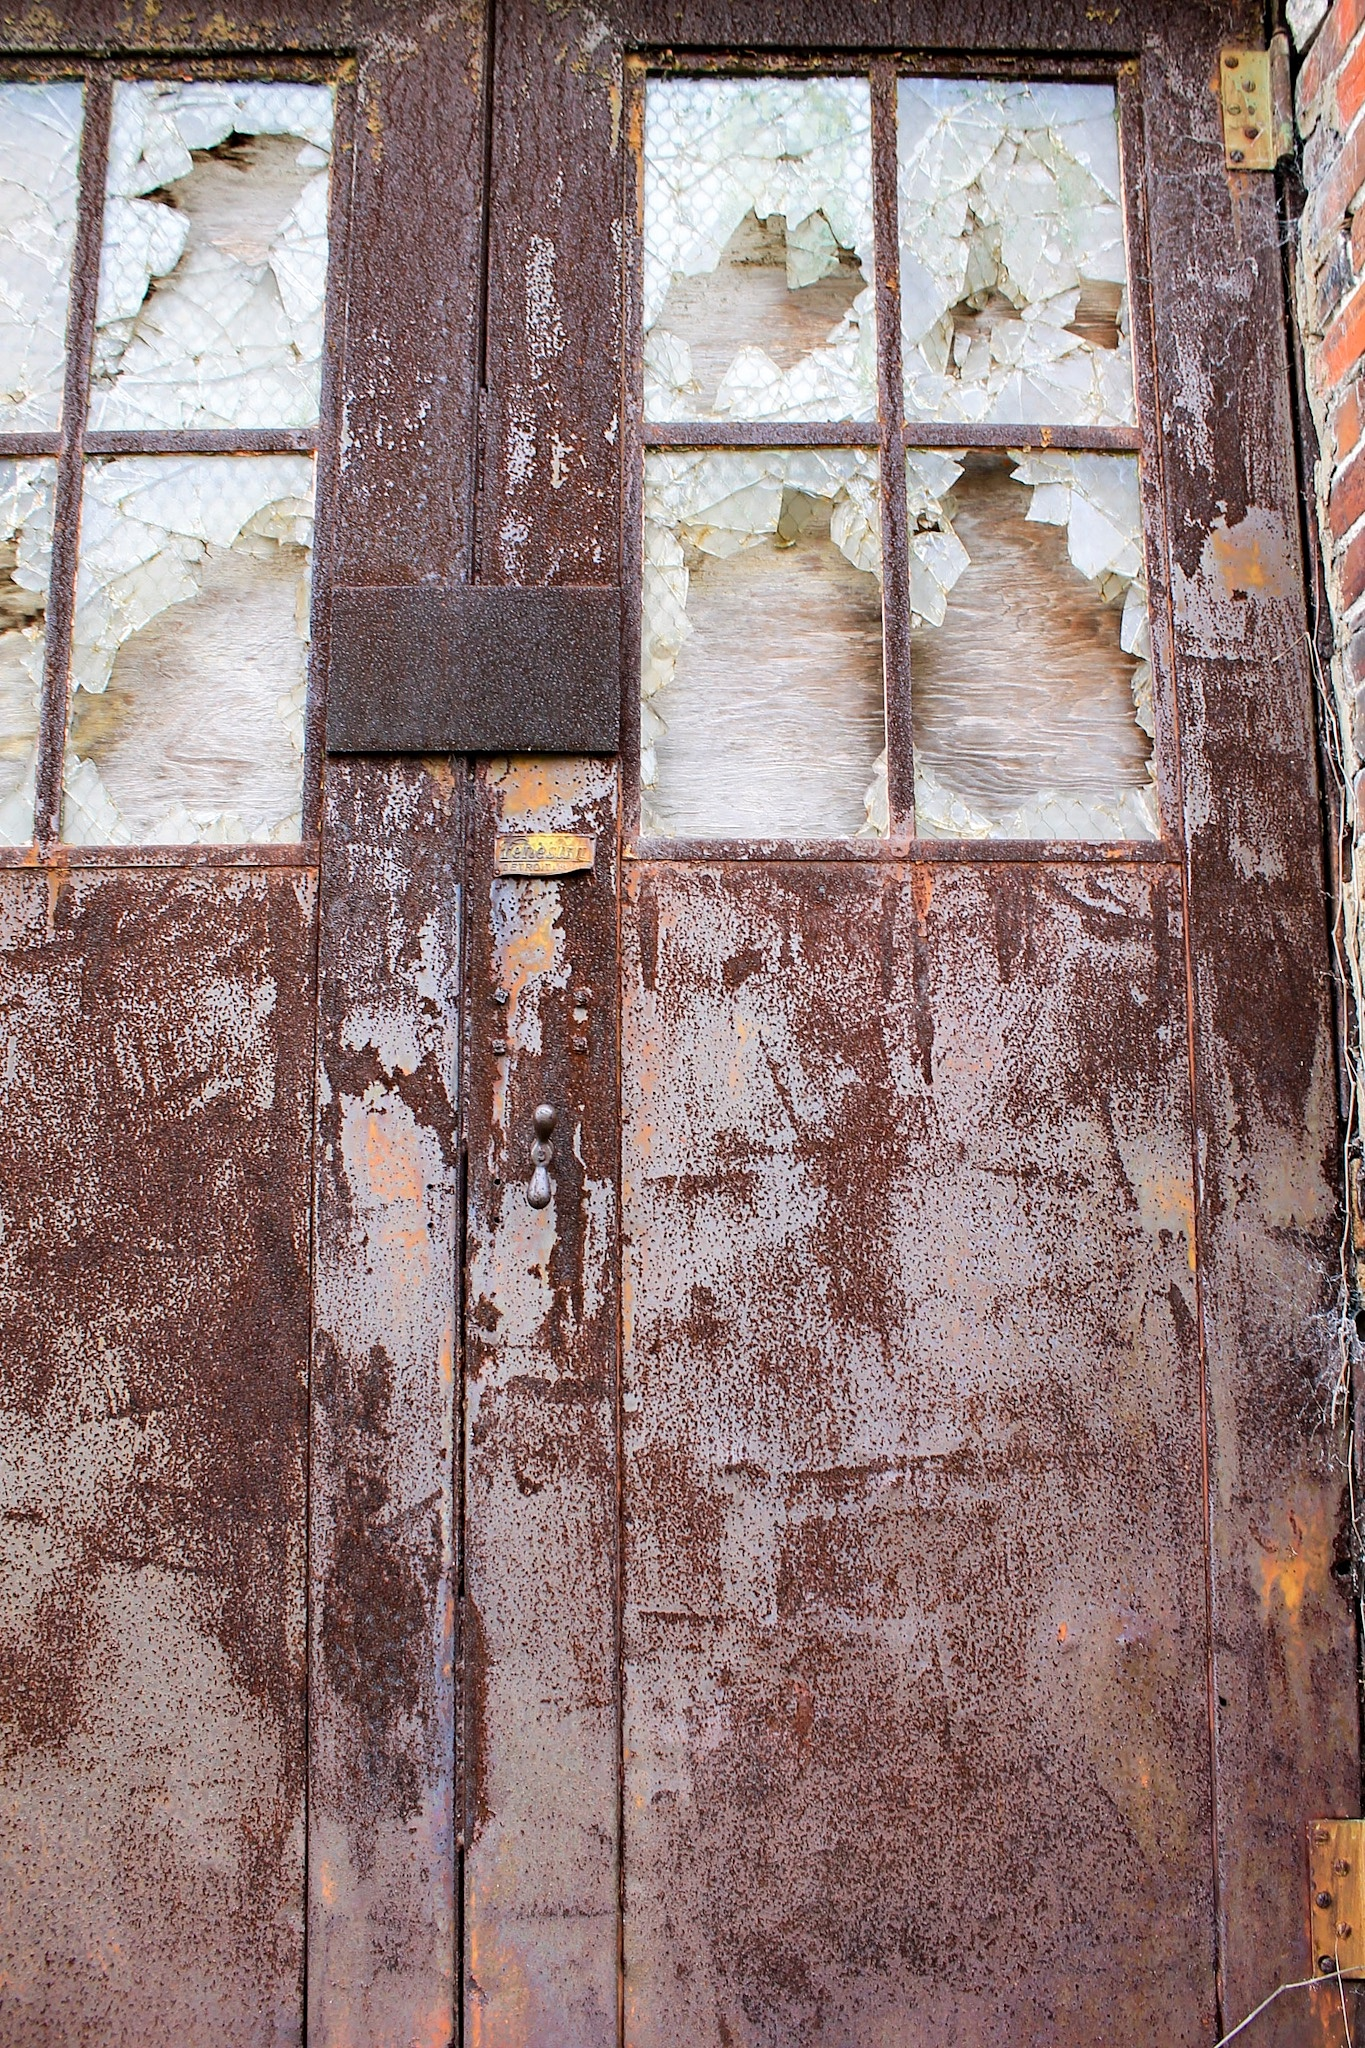 Abandoned Building Door by JustinYo